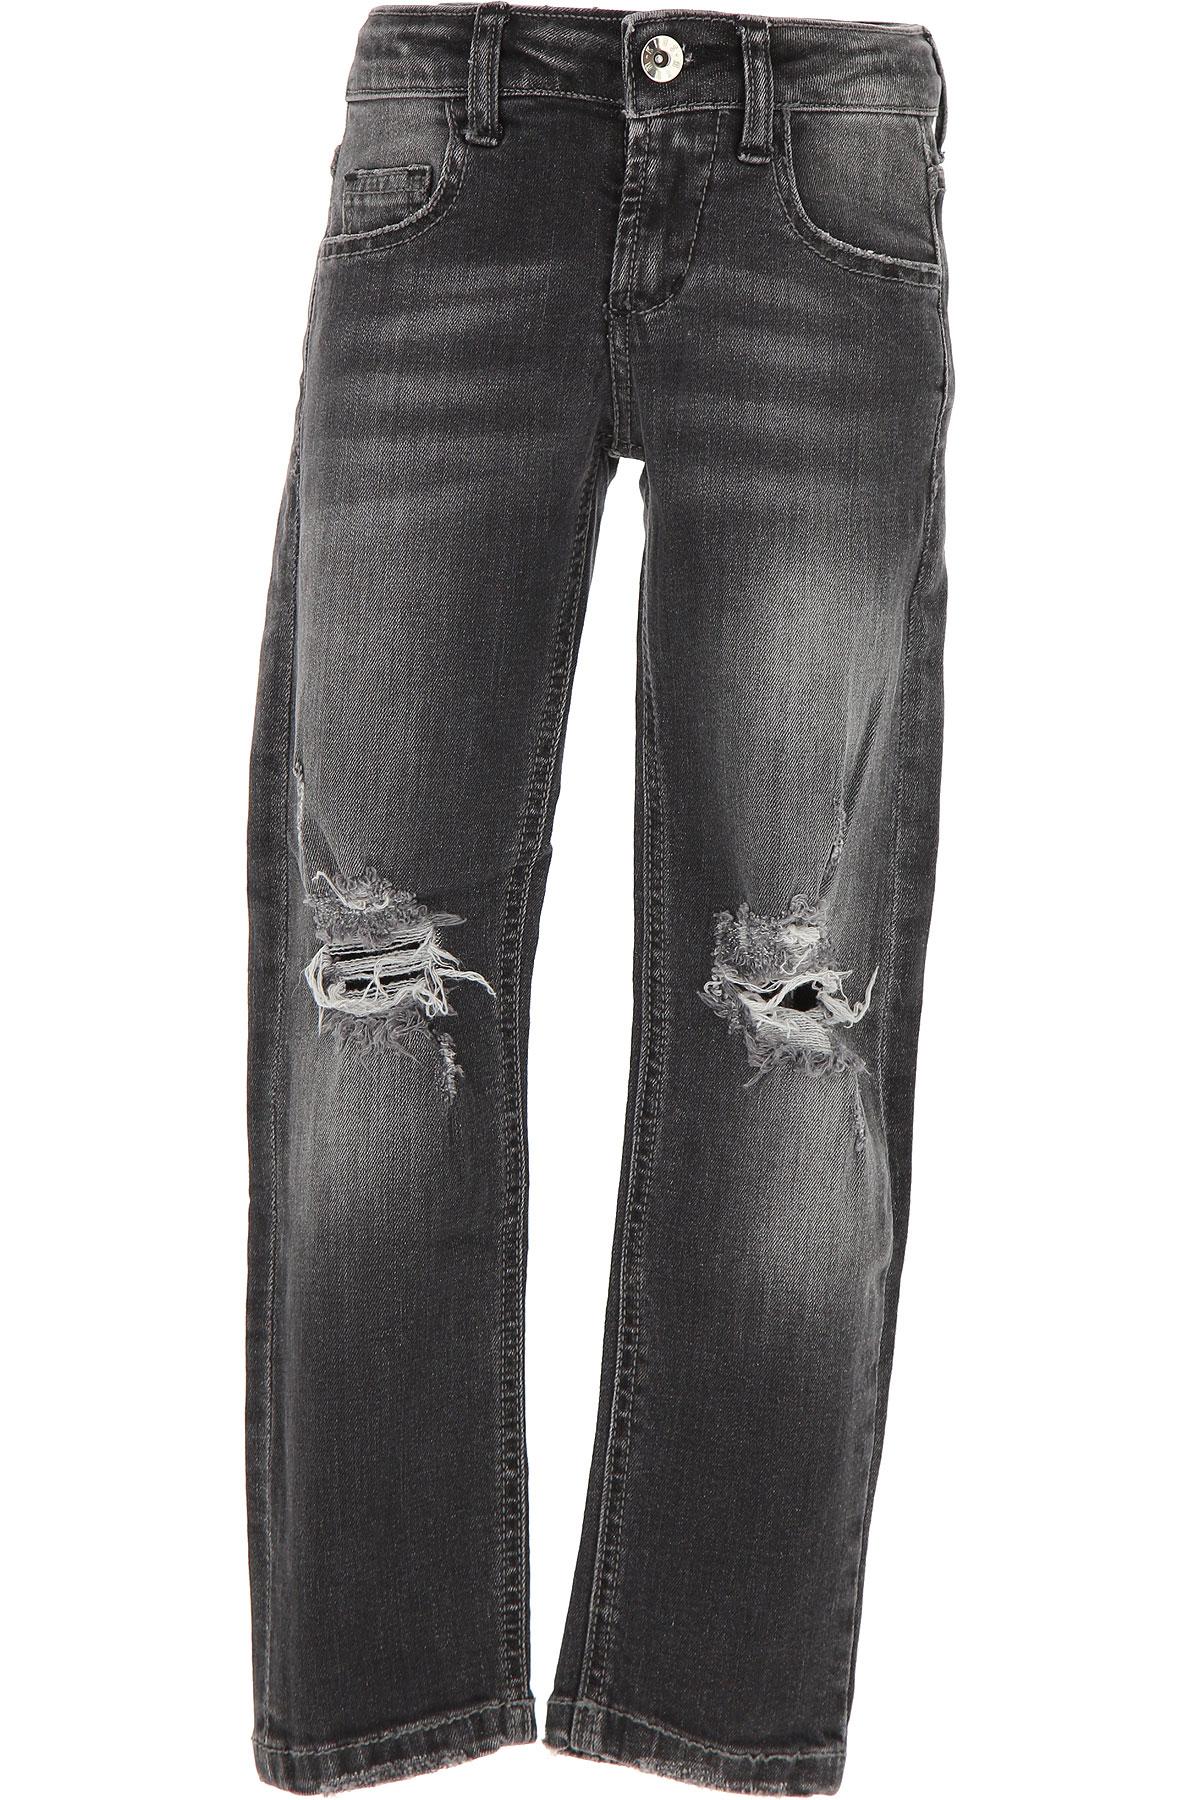 MSGM Kids Jeans for Boys On Sale in Outlet, Black, Cotton, 2017, 10Y 14Y 4Y 6Y 8Y